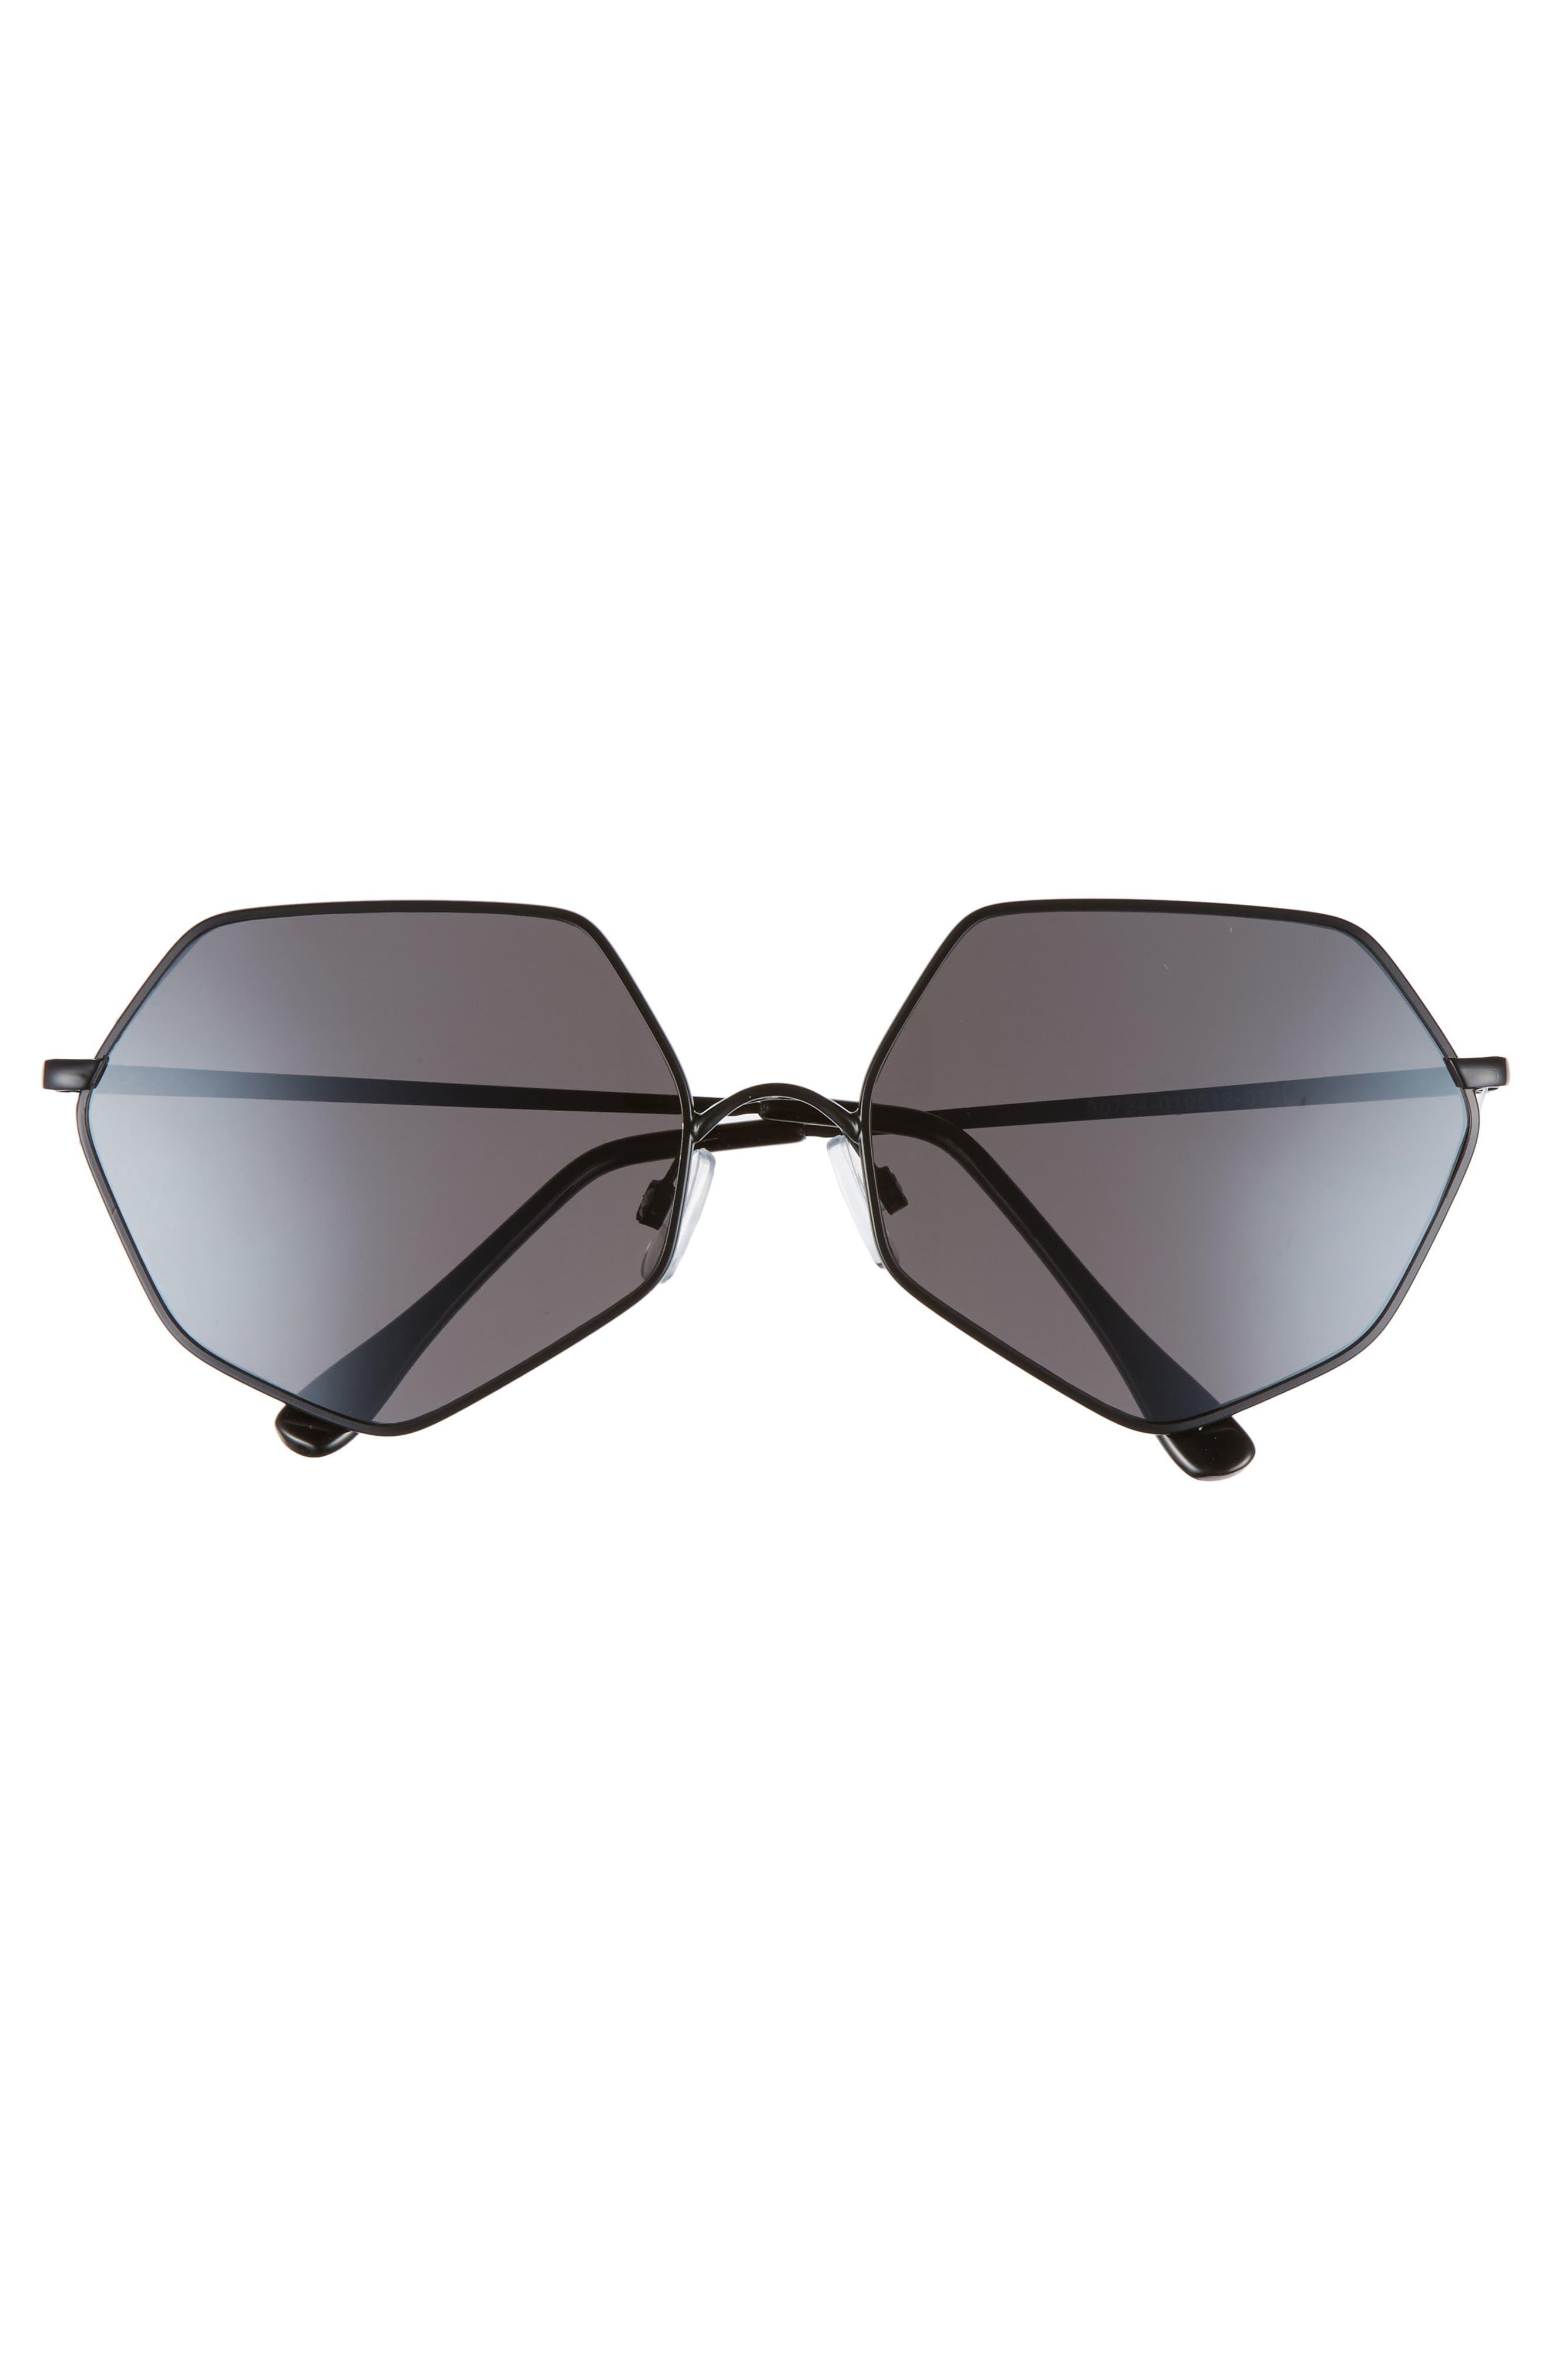 60 mm Geometric Metal Aviator Sunglasses,                             Alternate thumbnail 3, color,                             Black/ Black